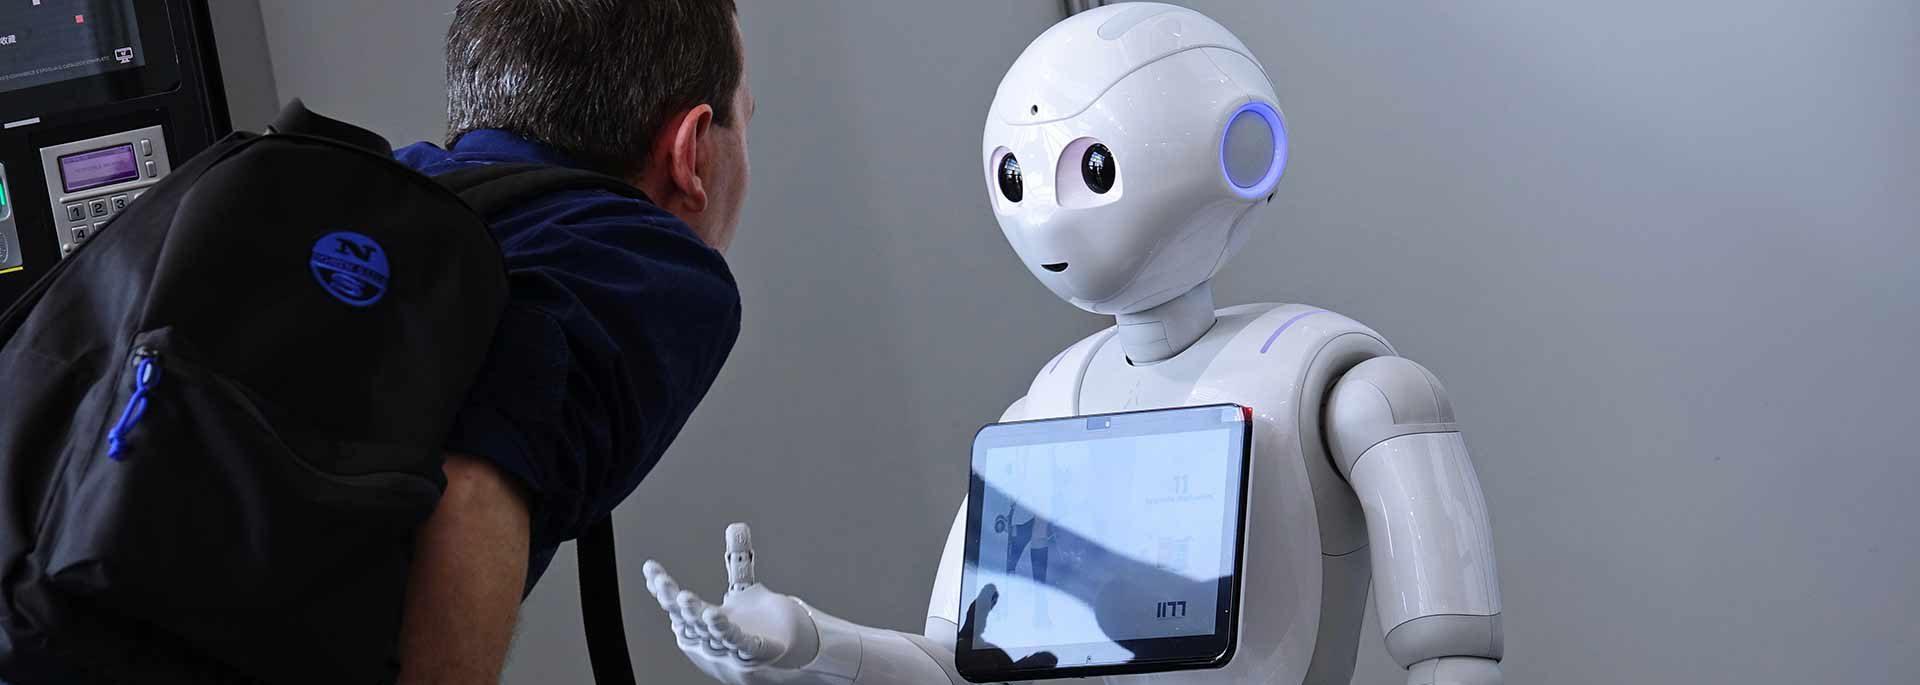 Roboter mit Kind